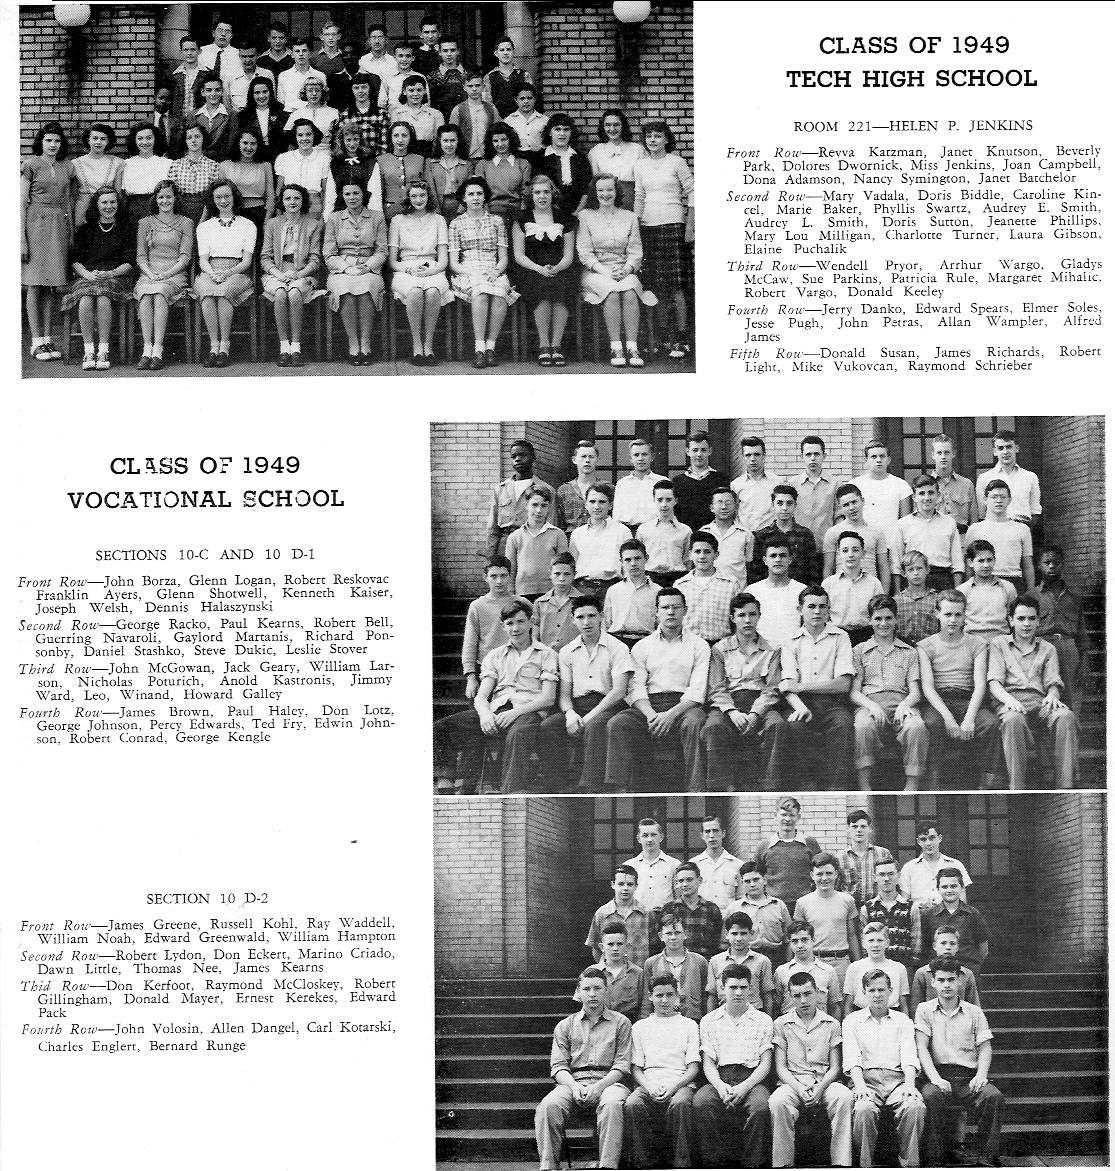 McKeesport High School - 1947 - Allegheny County, PA